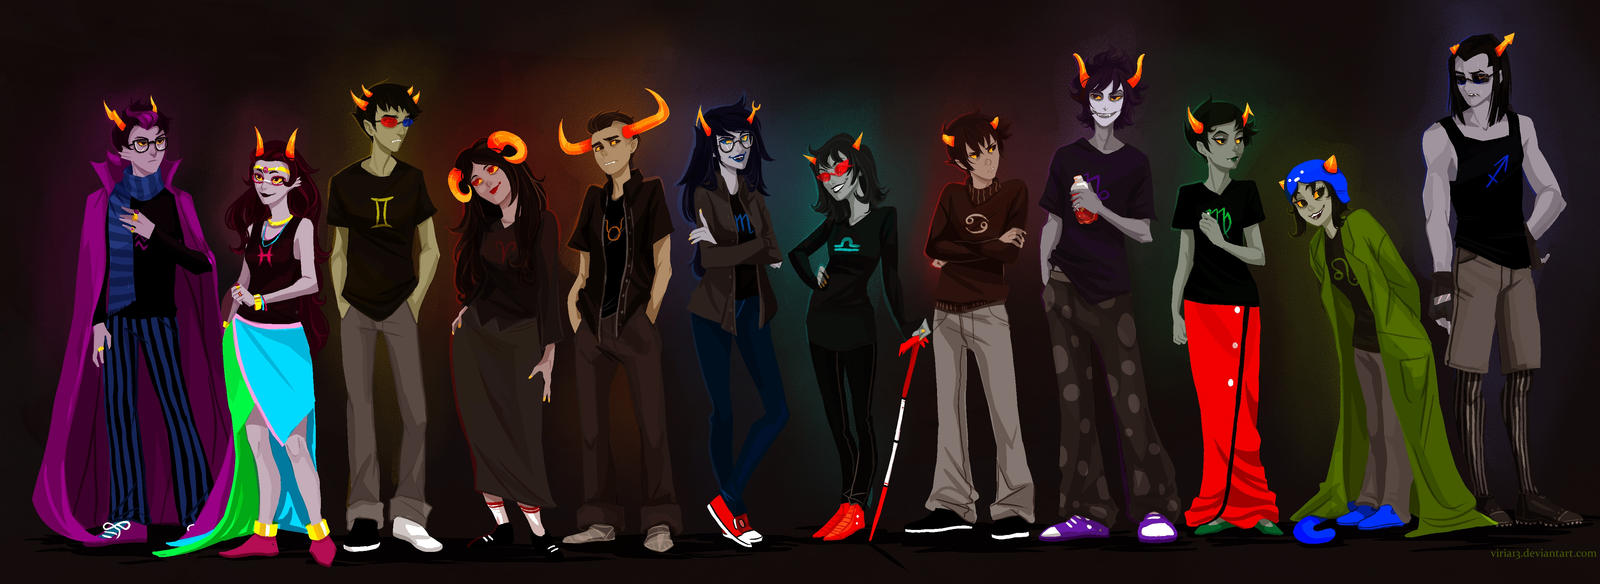 Homestuck trolls by viria13